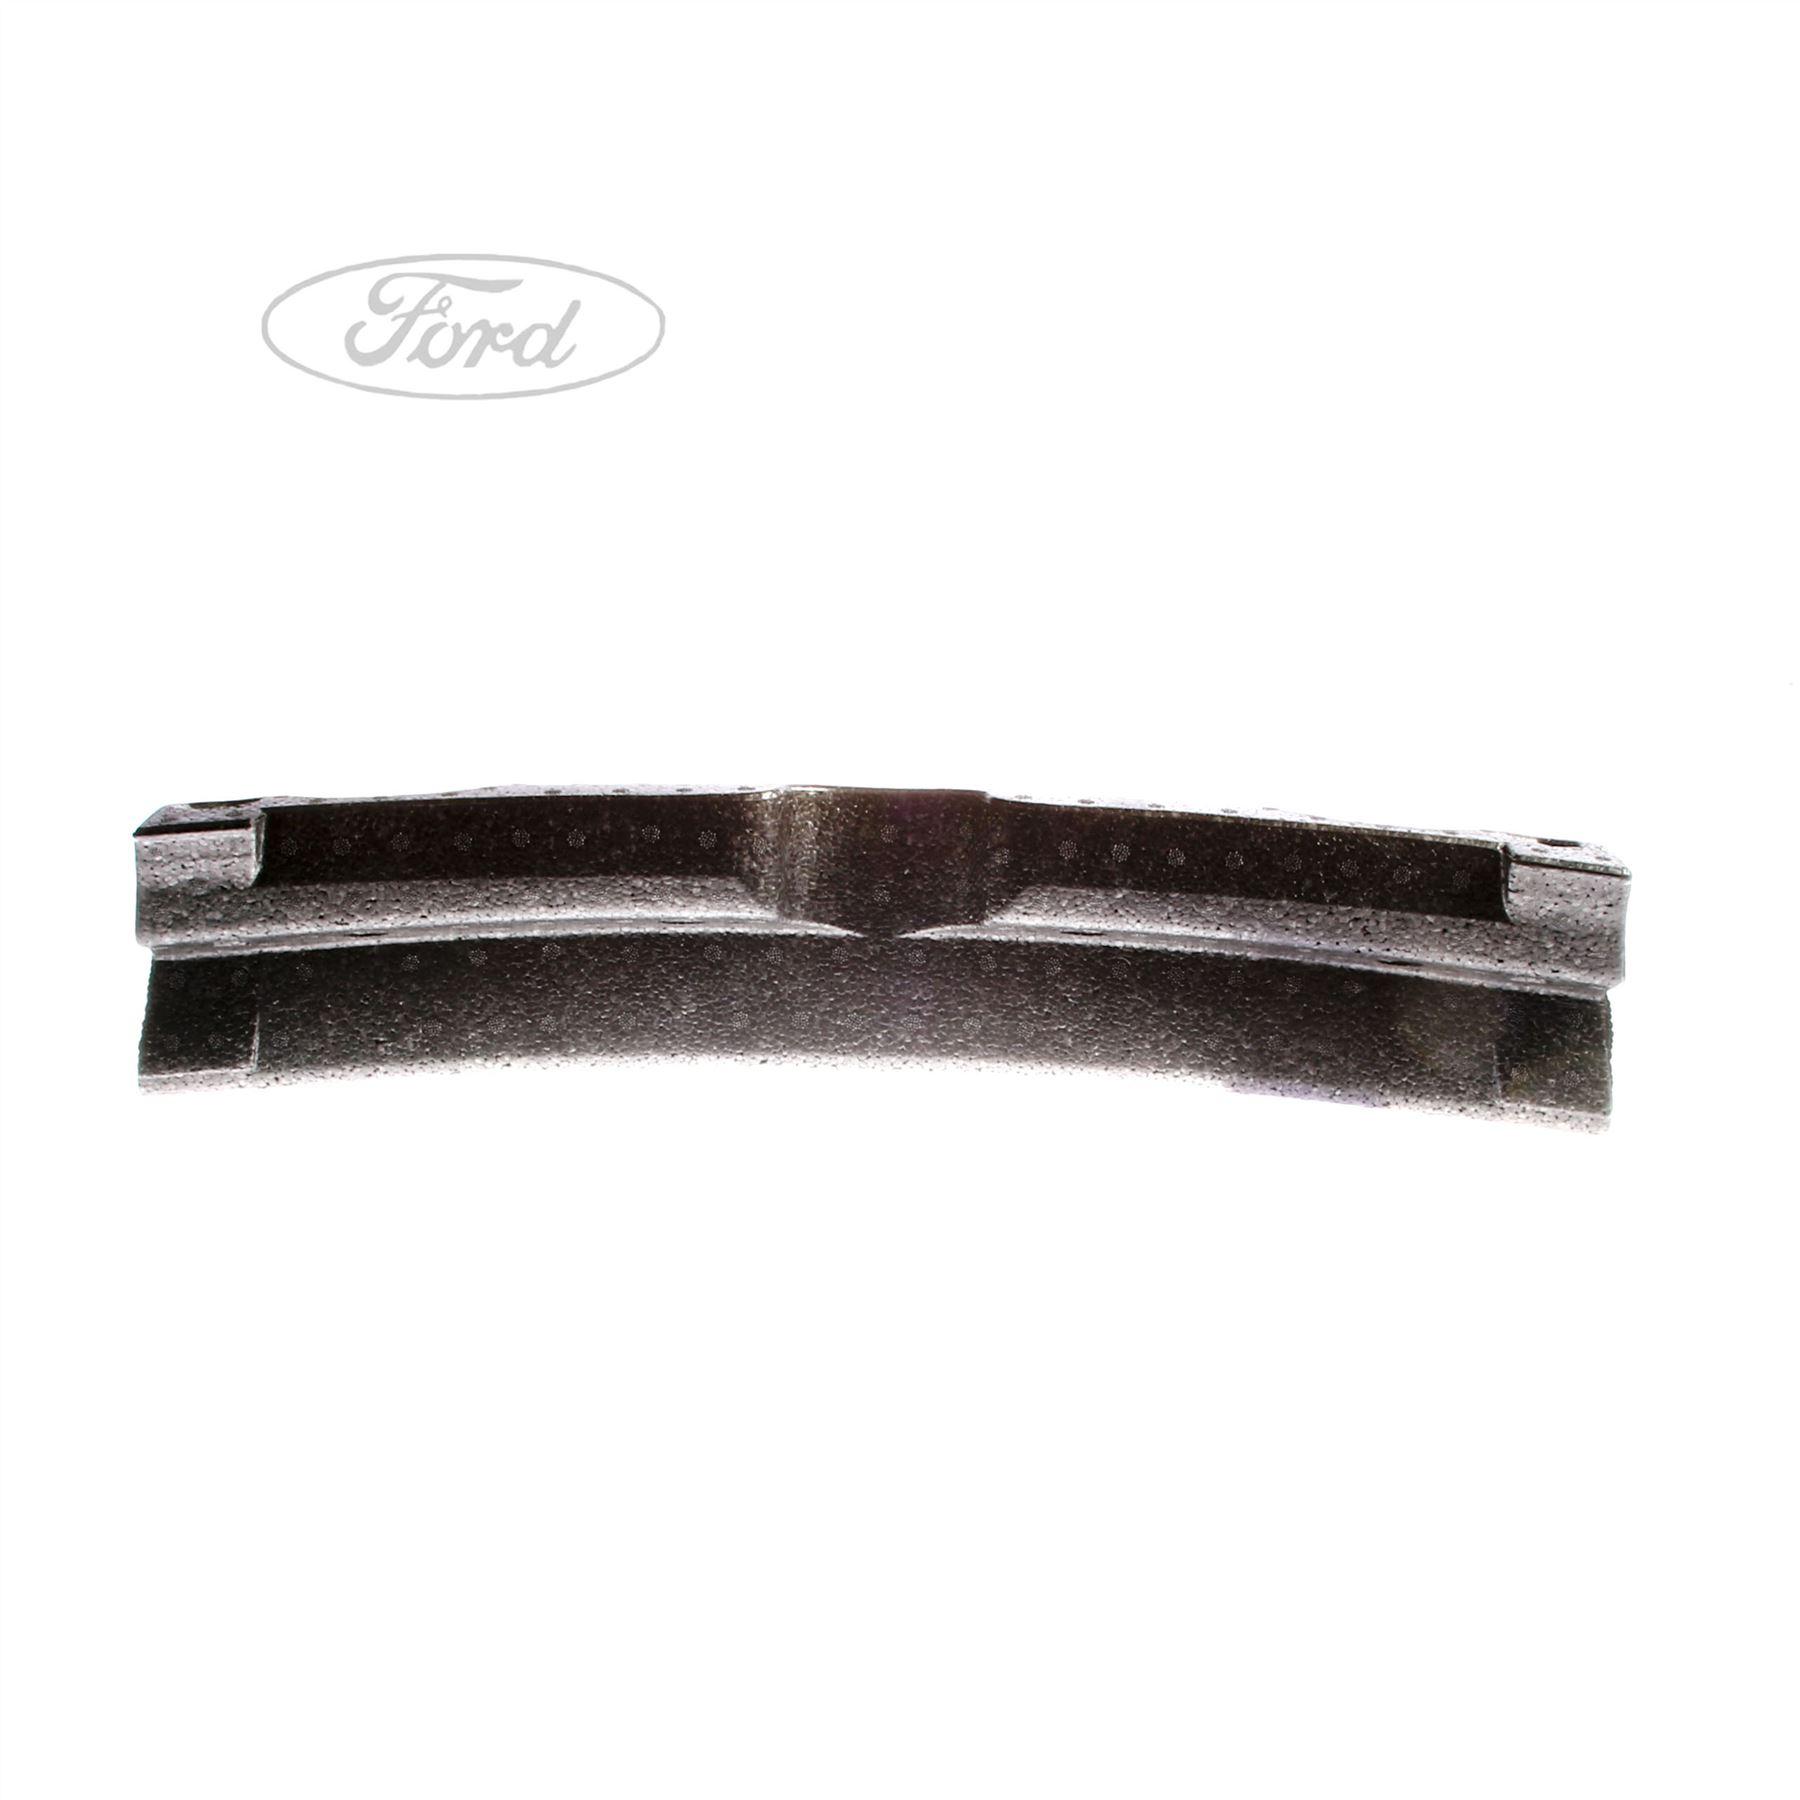 Genuine Ford Mondeo Mk Iii Rear Bumper Energy Absorbing Foam Pad 5894 1318182